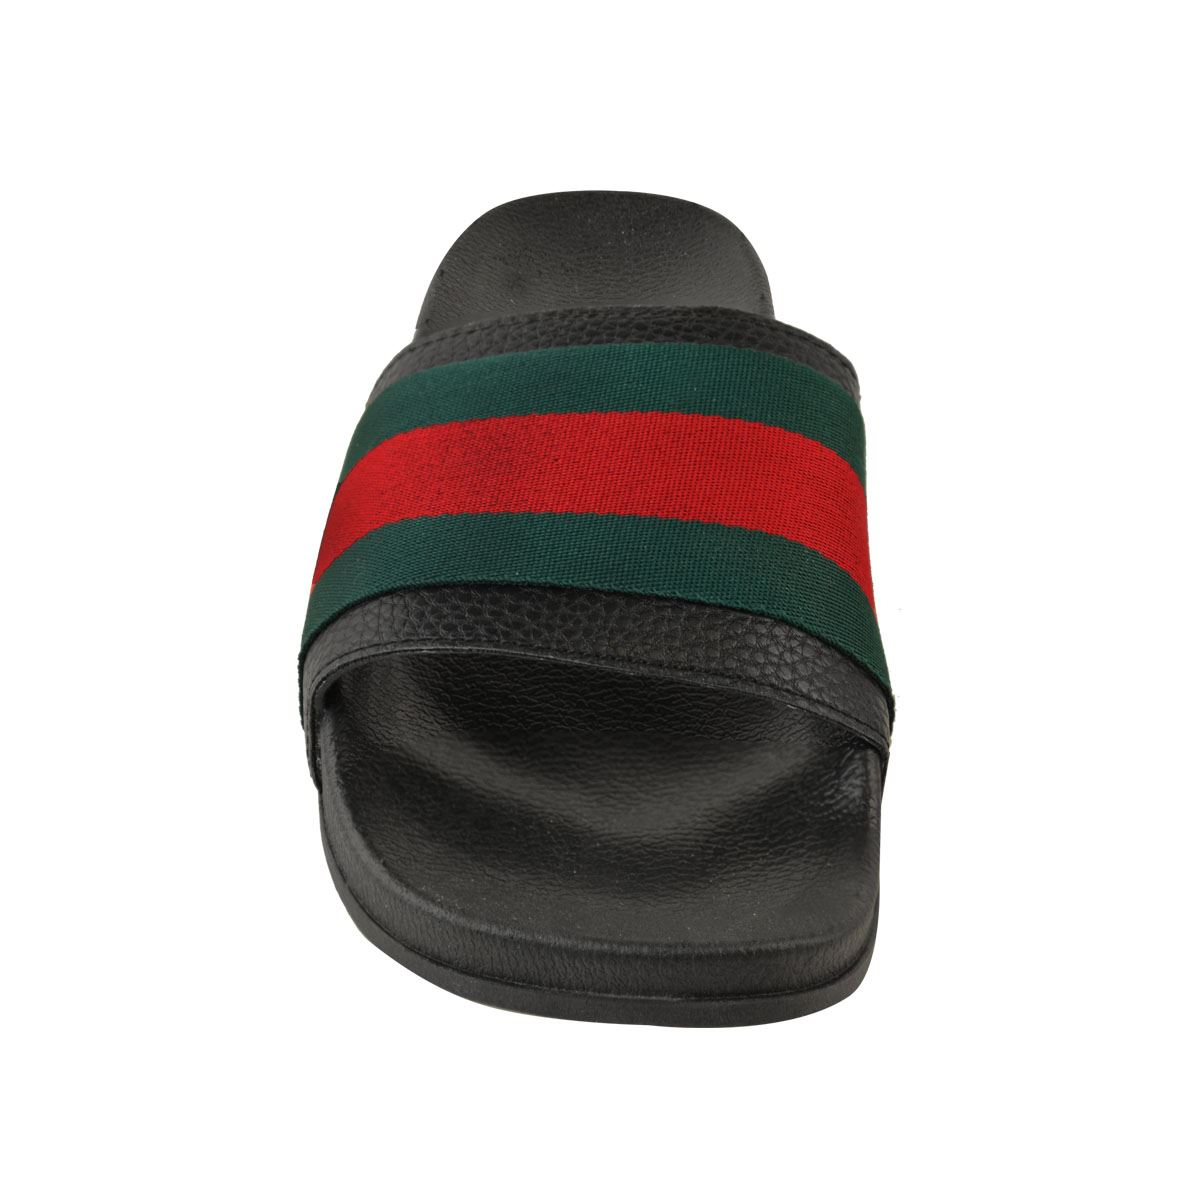 Womens-Striped-Sliders-Slides-Flat-Slip-On-Mules-Summer-Fashion-Sandals-Shoes-Sz thumbnail 6